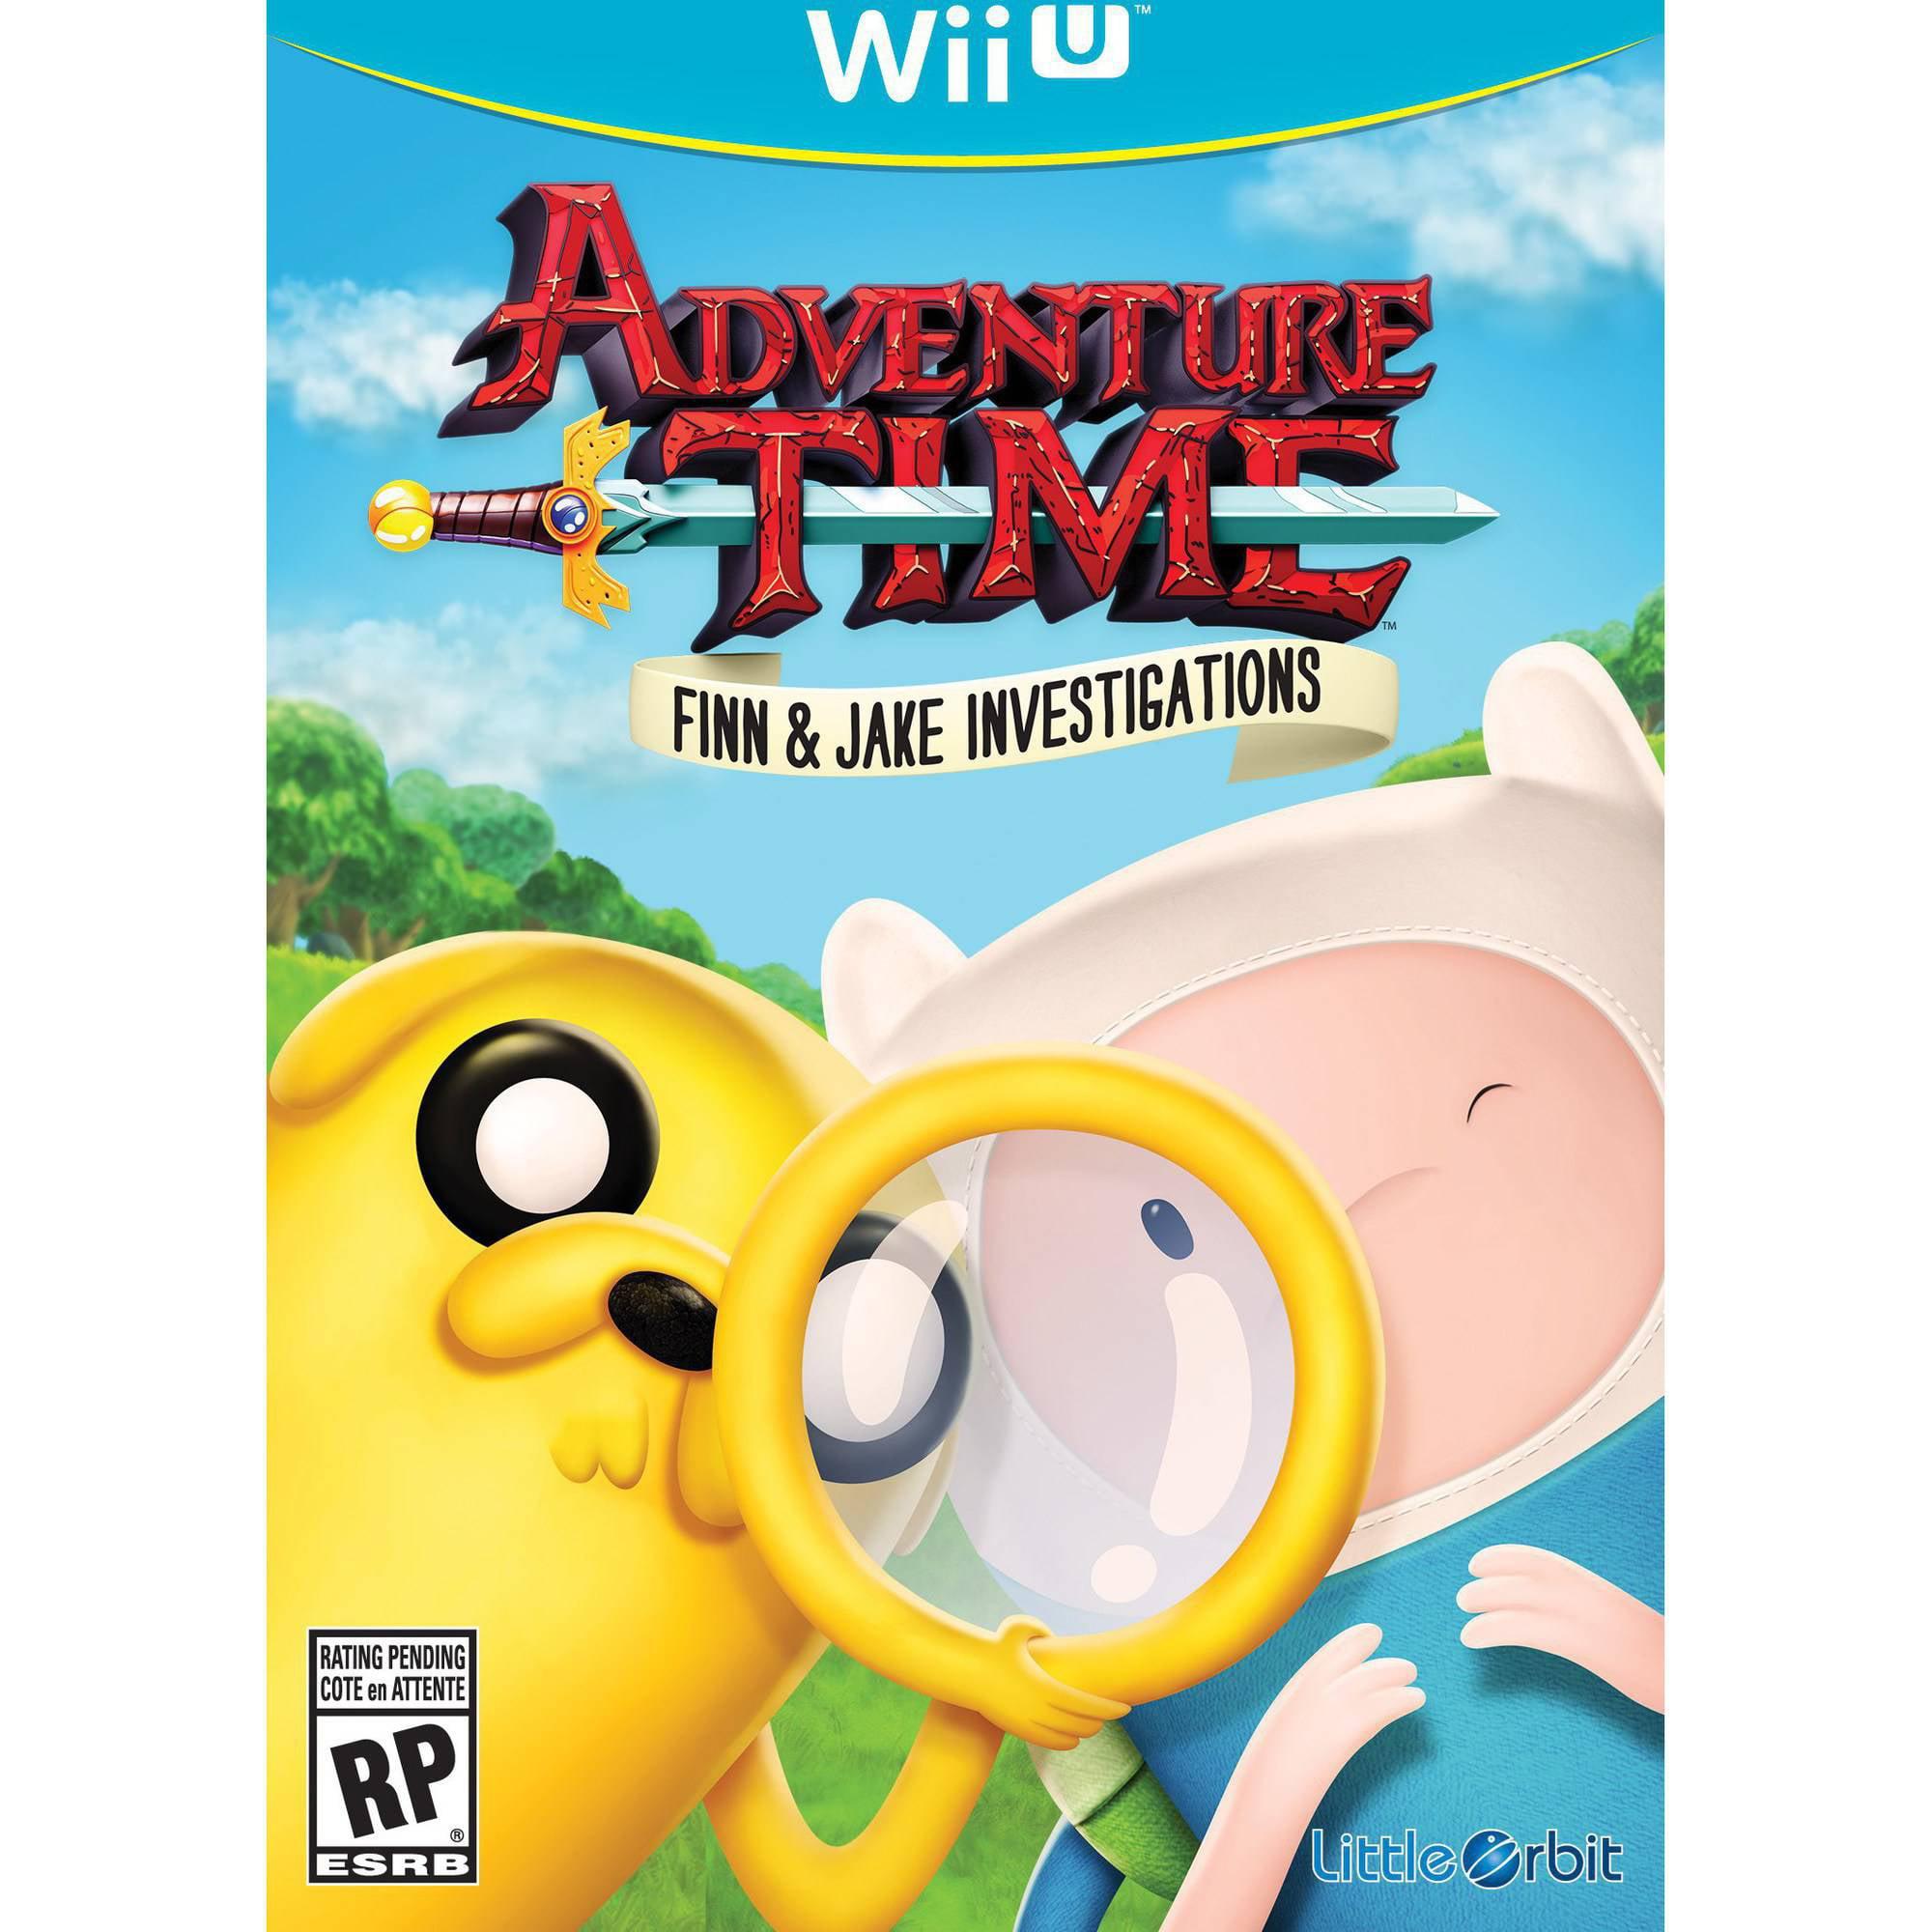 Adventure Time Finn And Jake Investigations (Little Orbit)